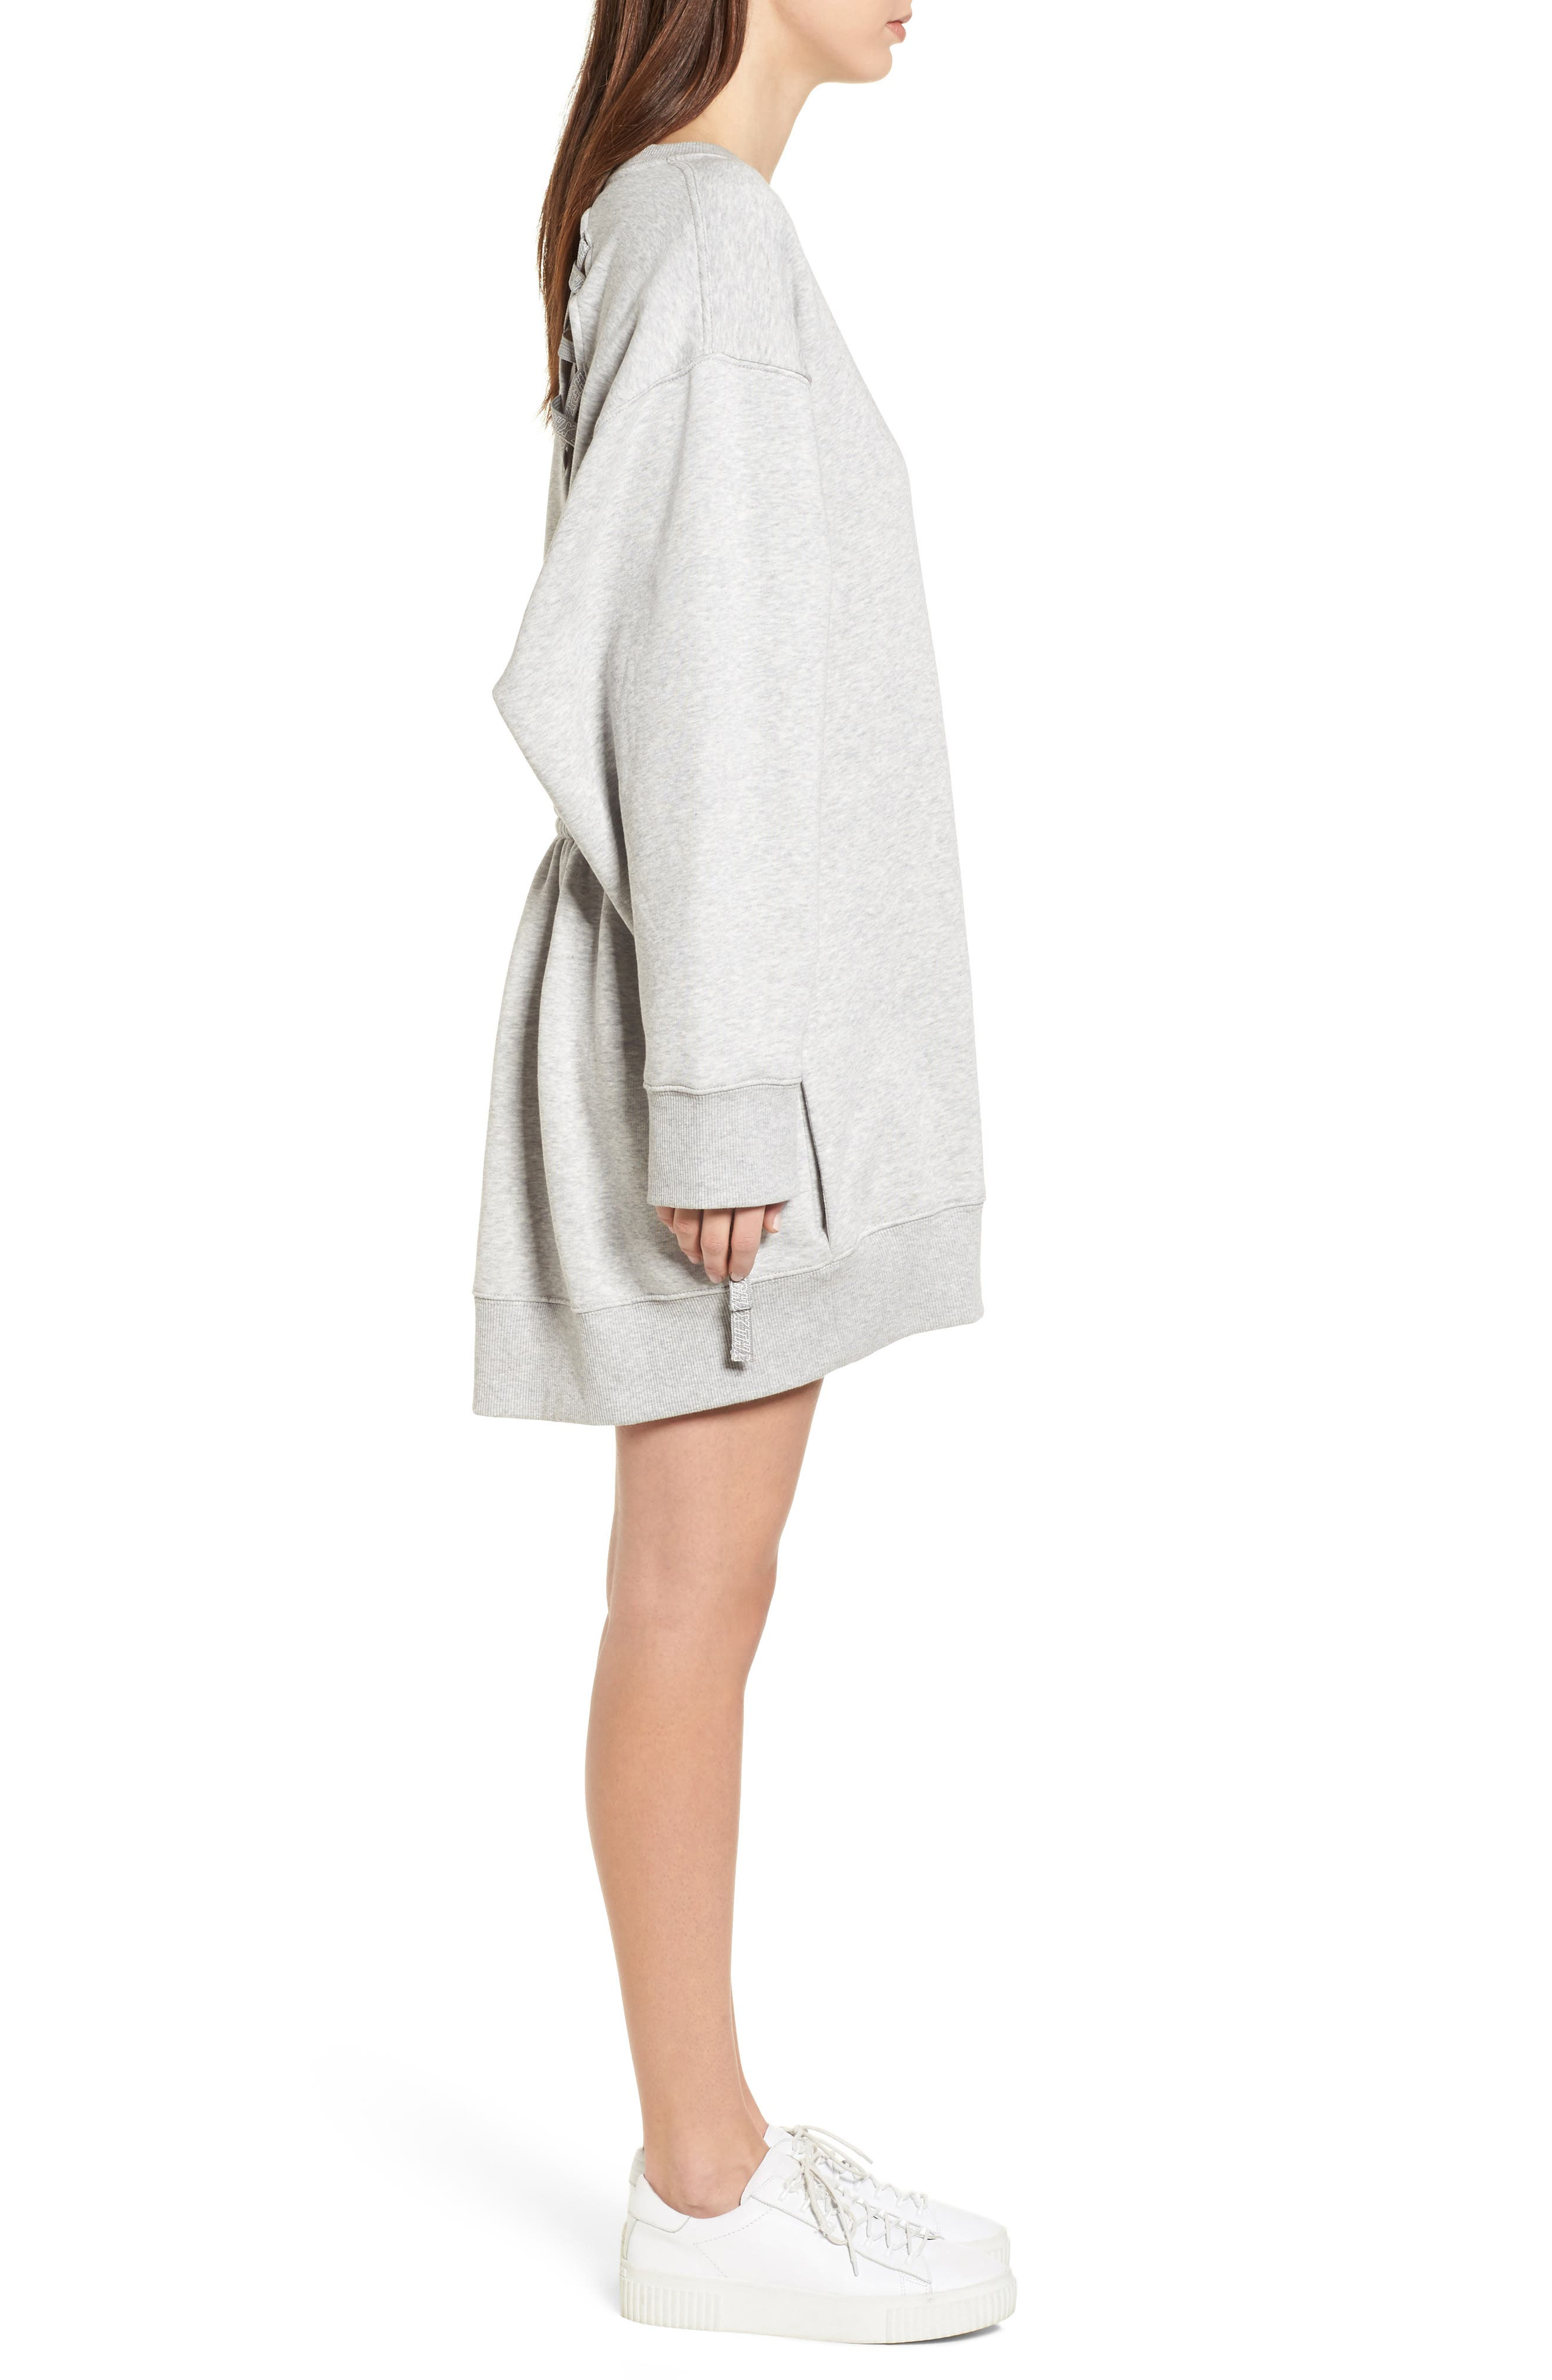 x Gigi Hadid Sweatshirt Dress,                             Alternate thumbnail 3, color,                             020